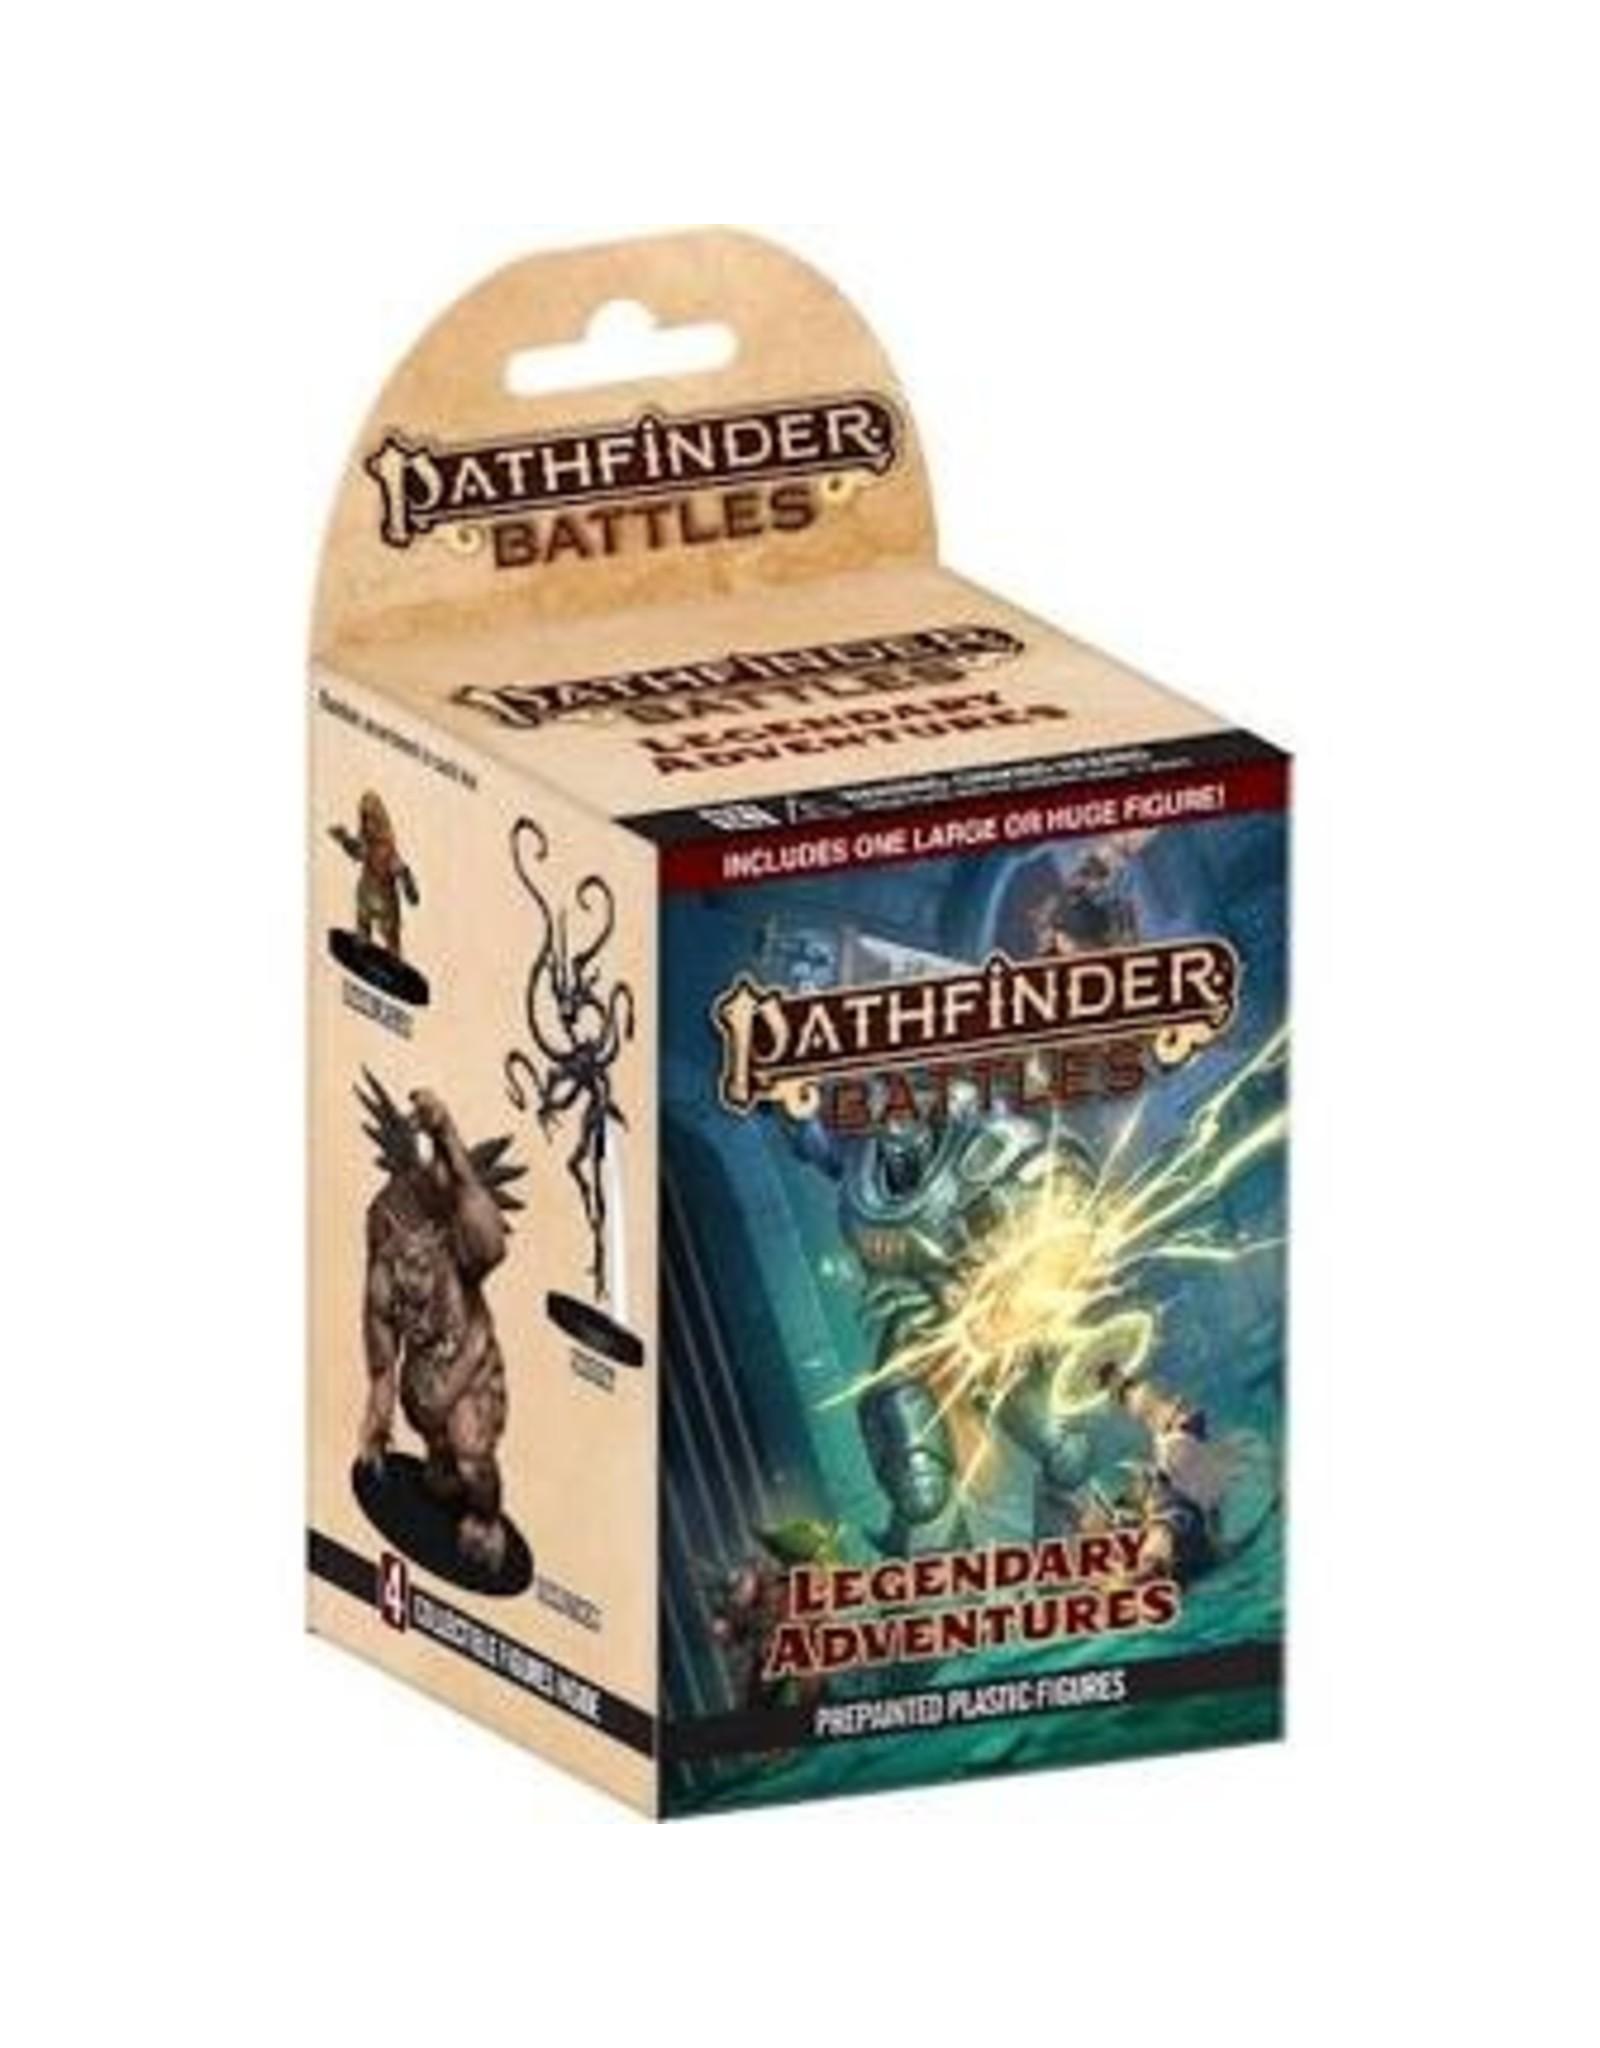 Wiz Kids Pathfinder Battles: Legendary Adventures Booster